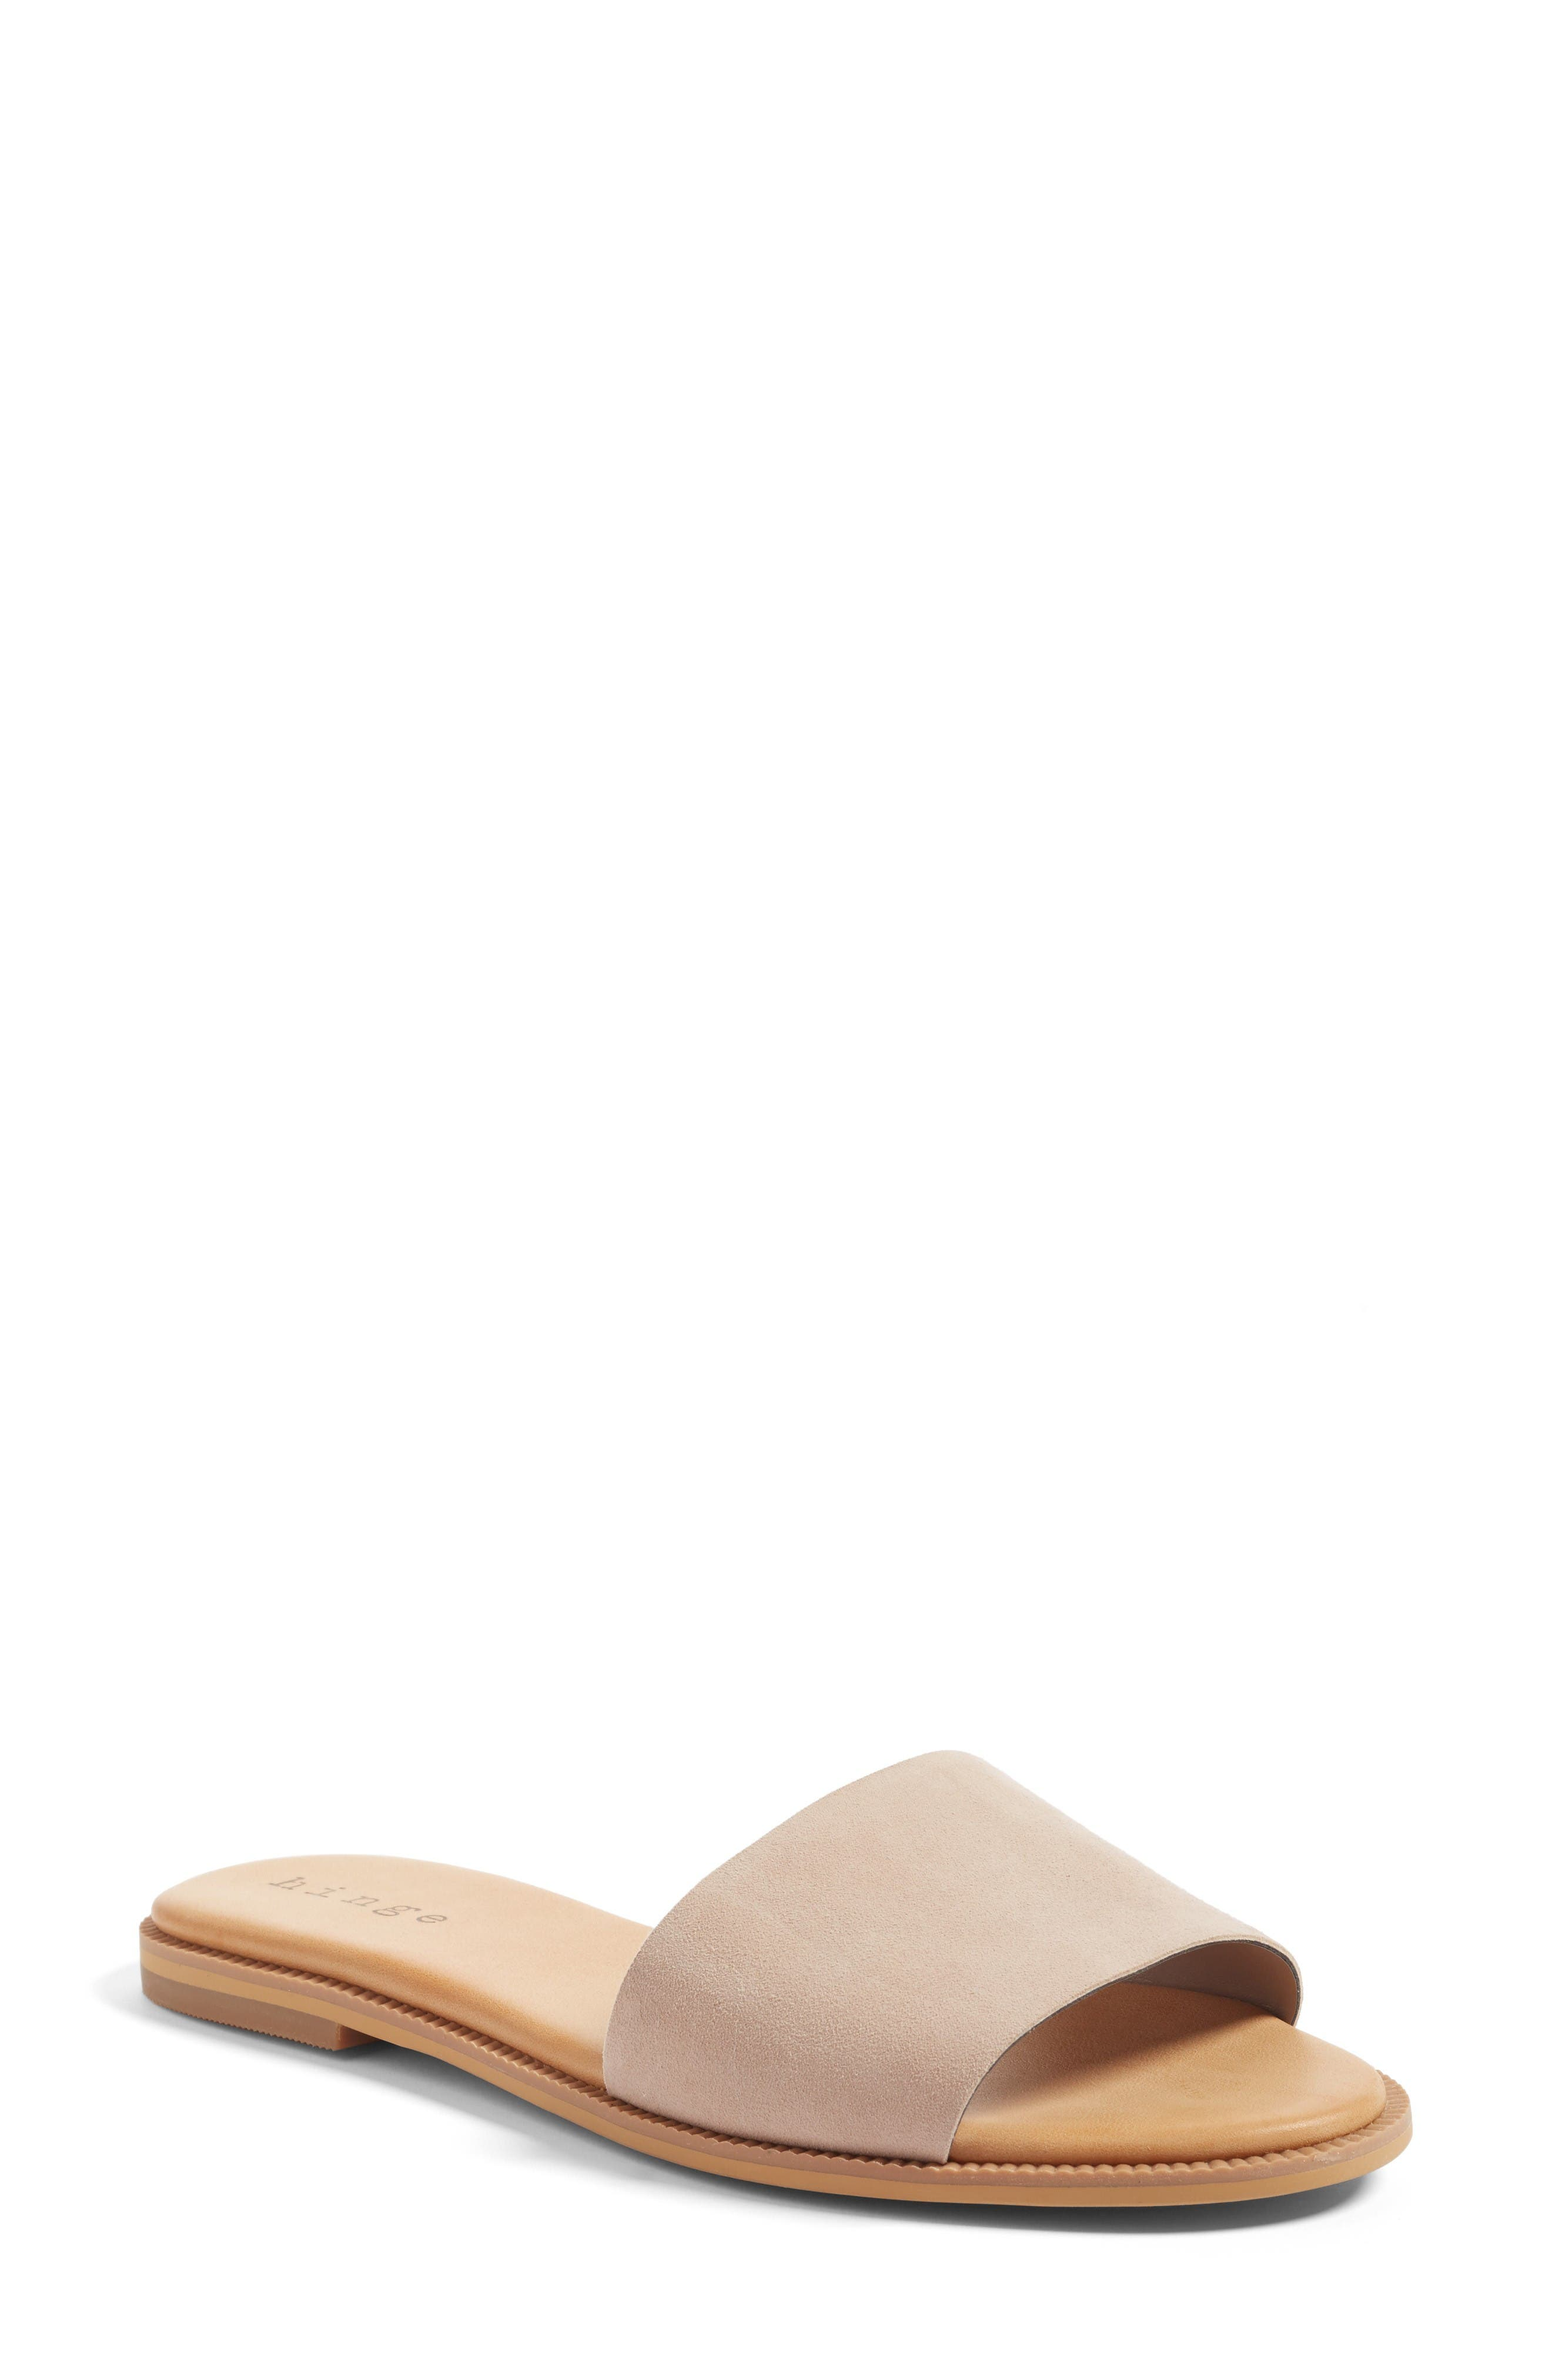 HINGE 'Mere' Flat Slide Sandal